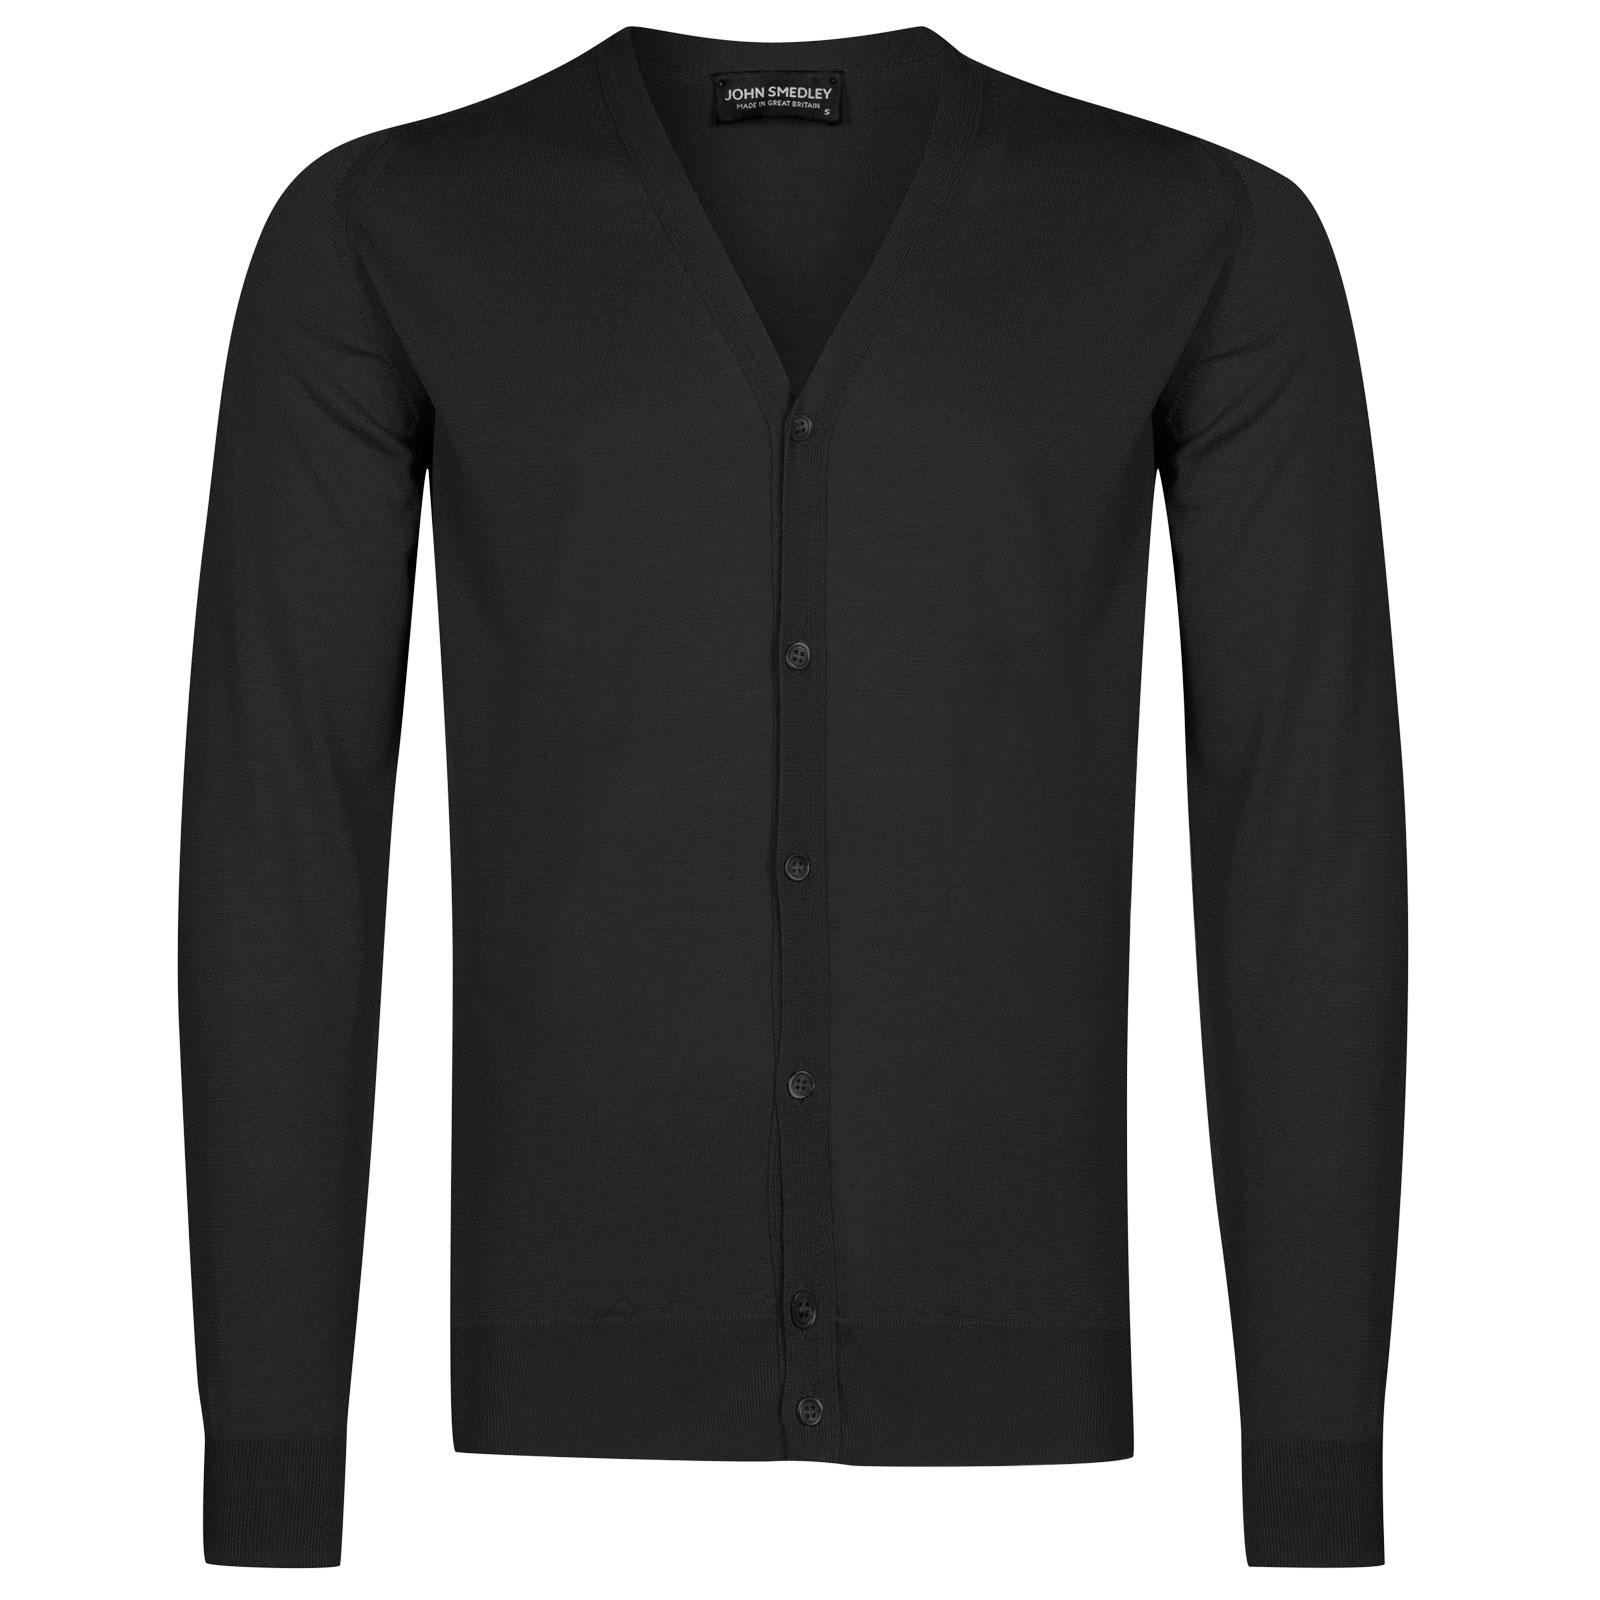 John Smedley petworth Merino Wool Cardigan in Black-S